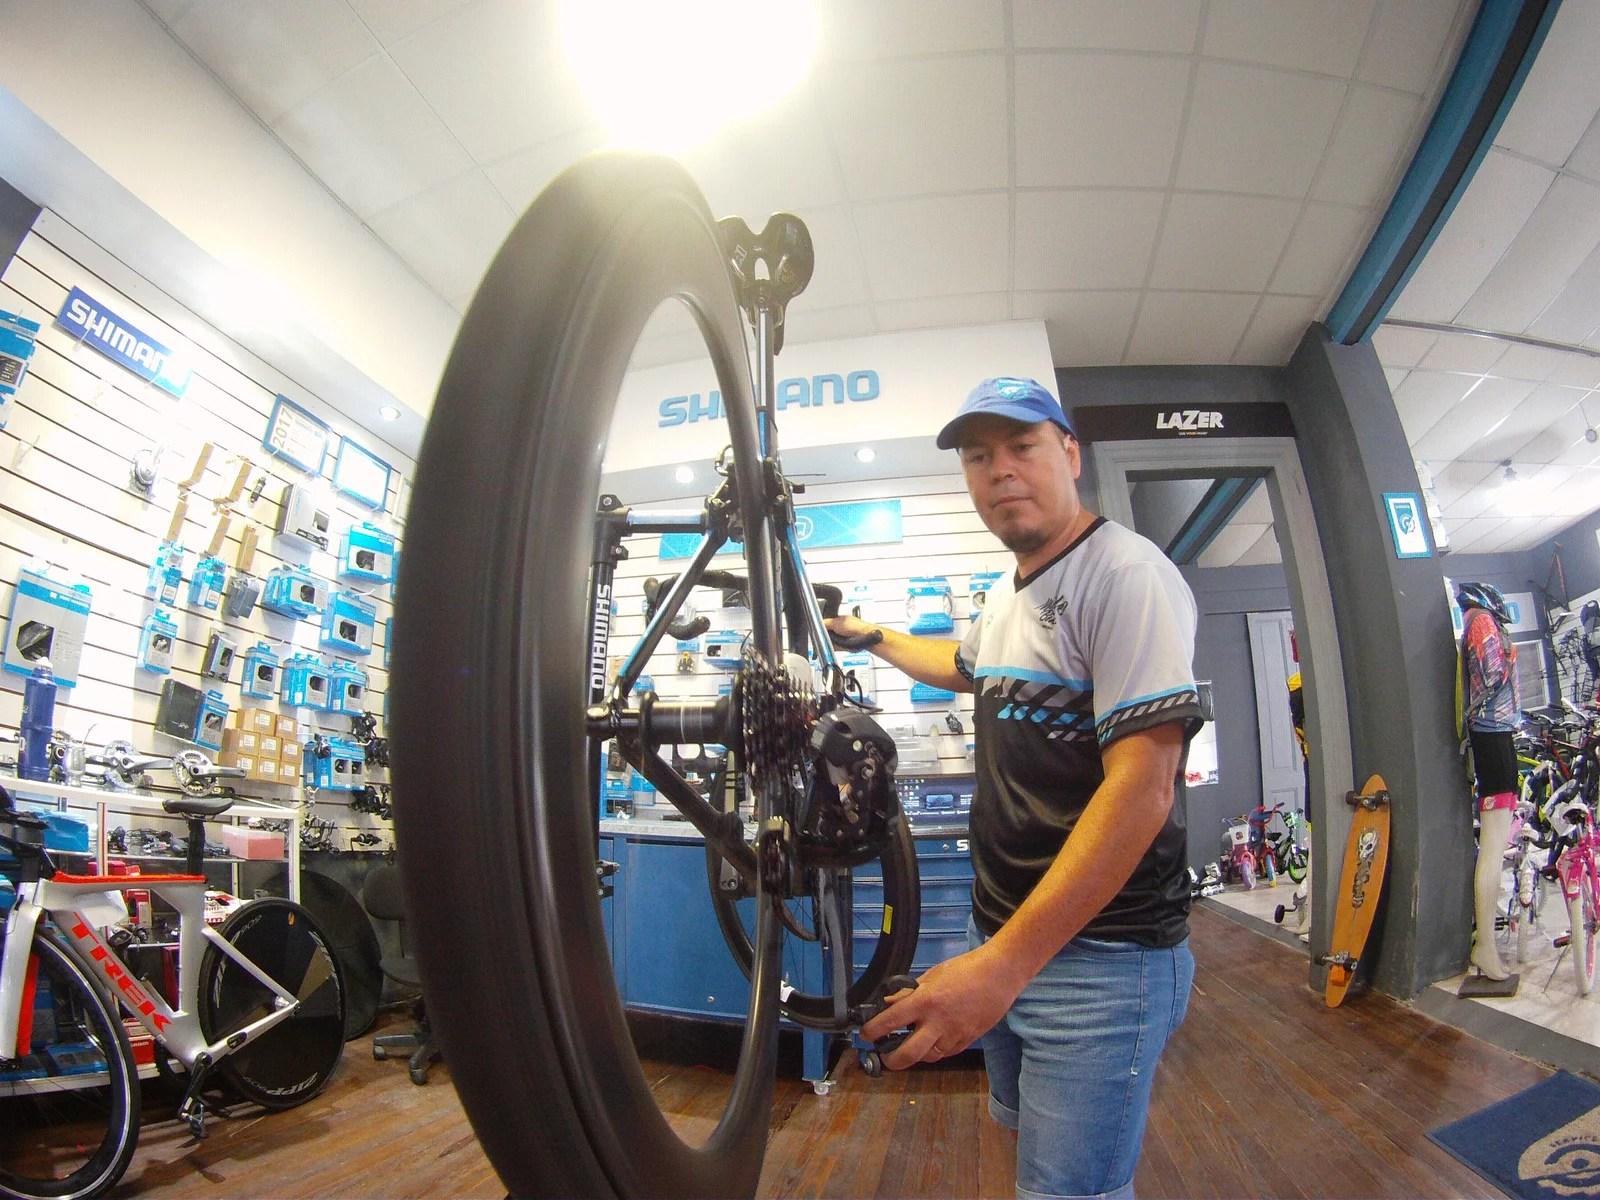 Shimano Service Center, mecanica, mundo bike